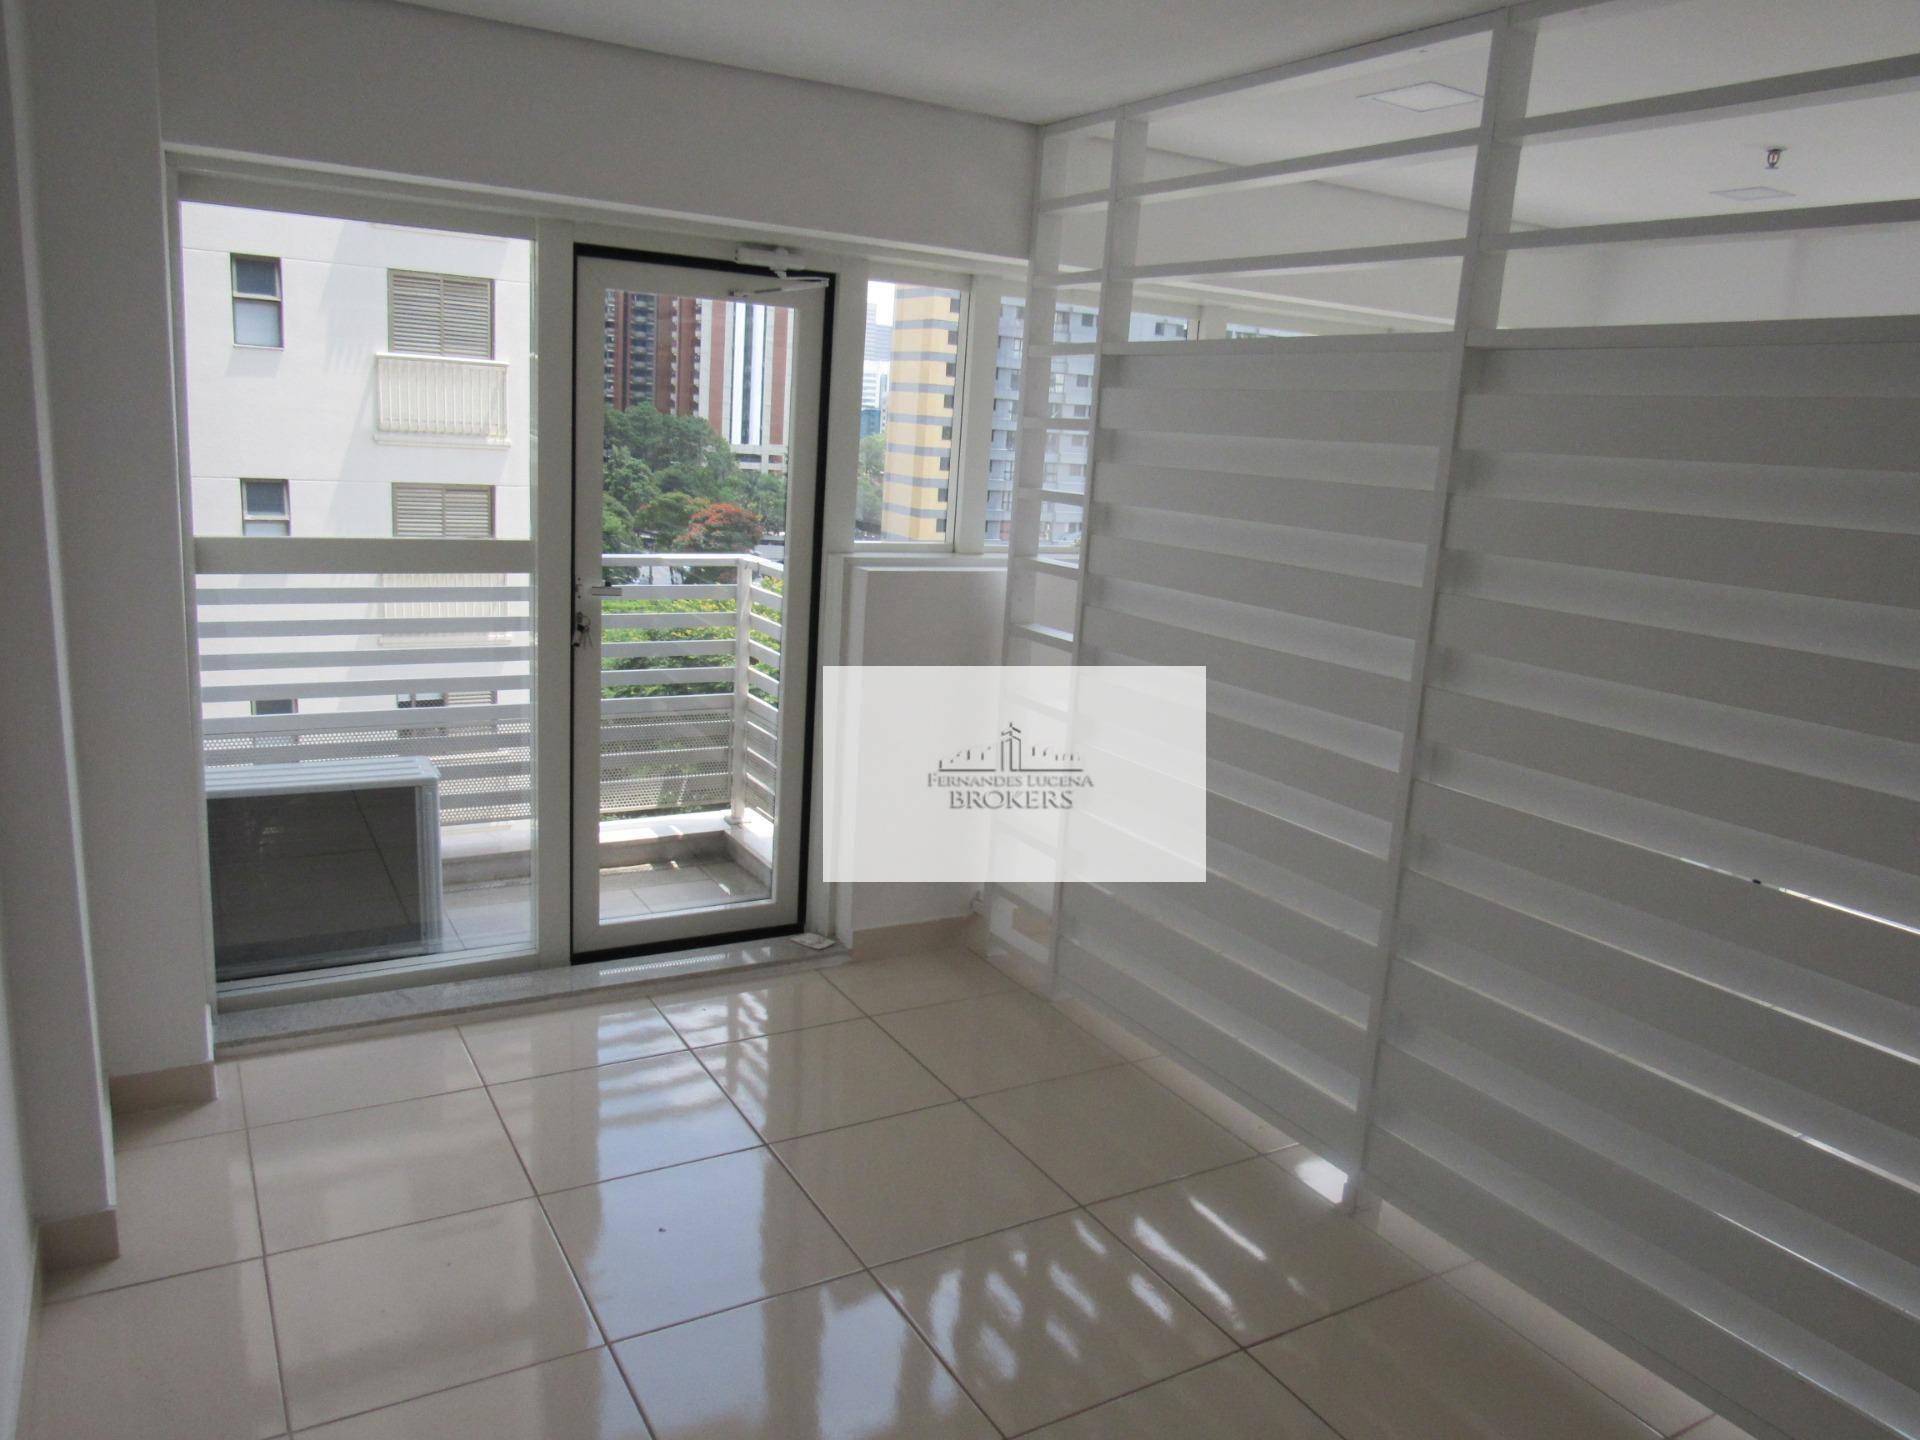 Conjunto para alugar, 42 m² por R$ 1.700/mês - Alphaville - Barueri/SP